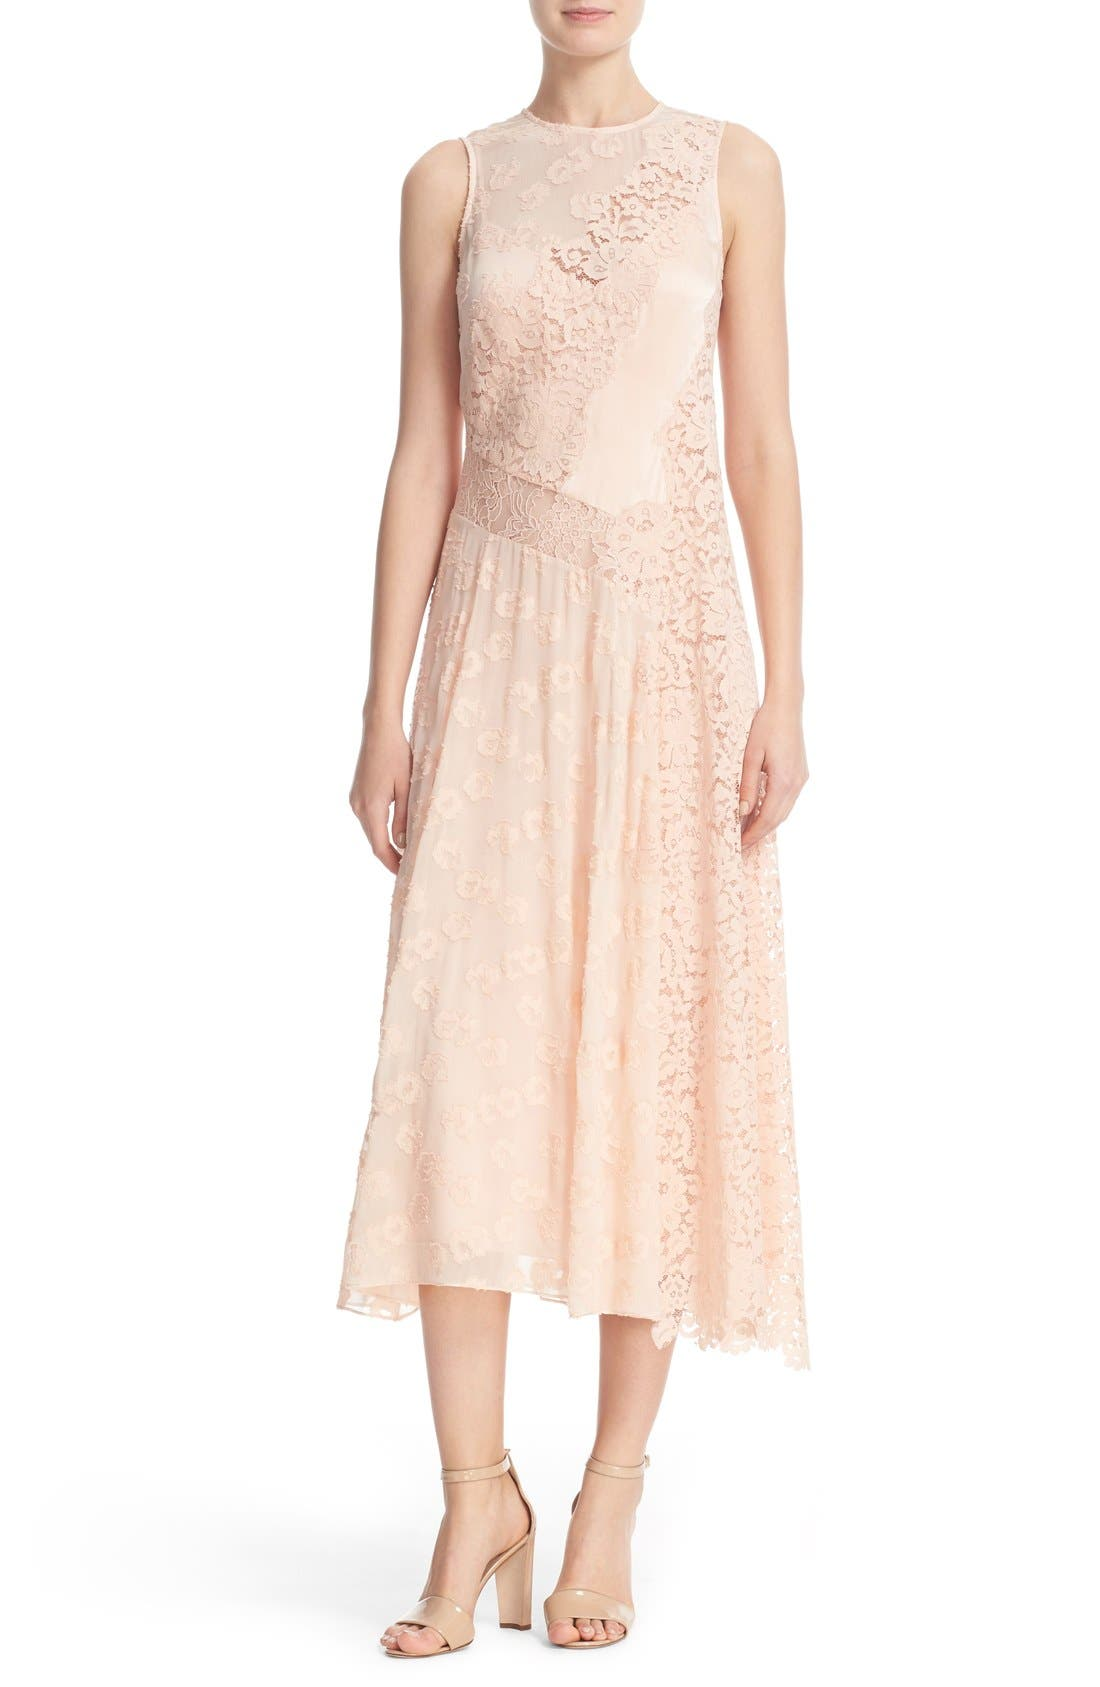 Alternate Image 1 Selected - Rebecca Taylor Chevron Lace Midi Dress